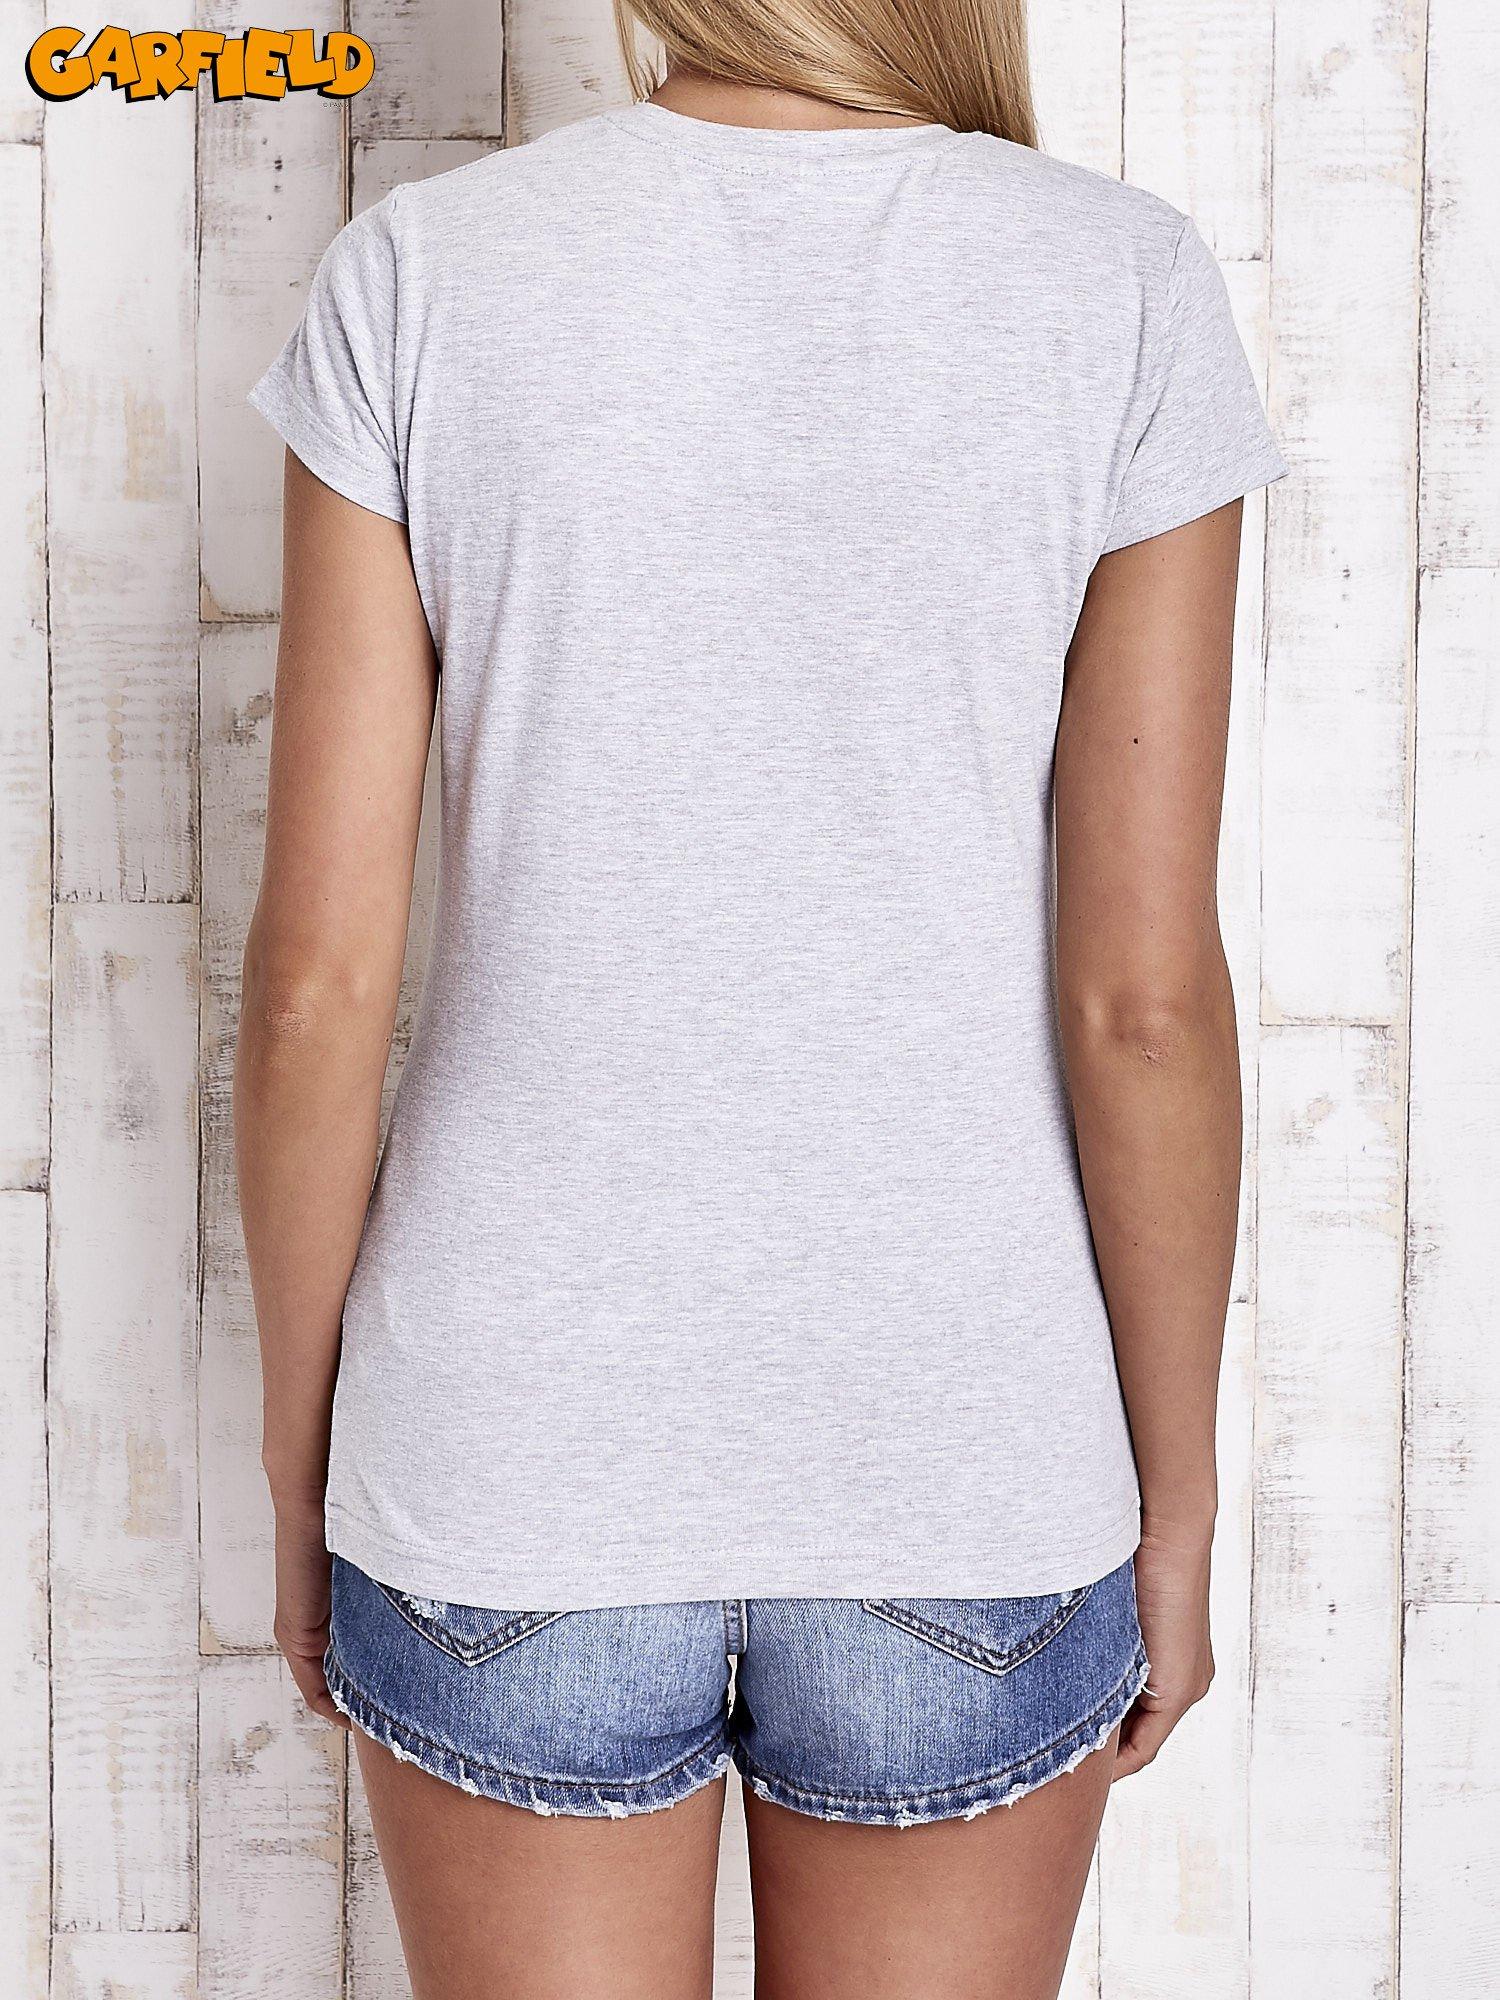 Szary t-shirt GARFIELD                                  zdj.                                  5